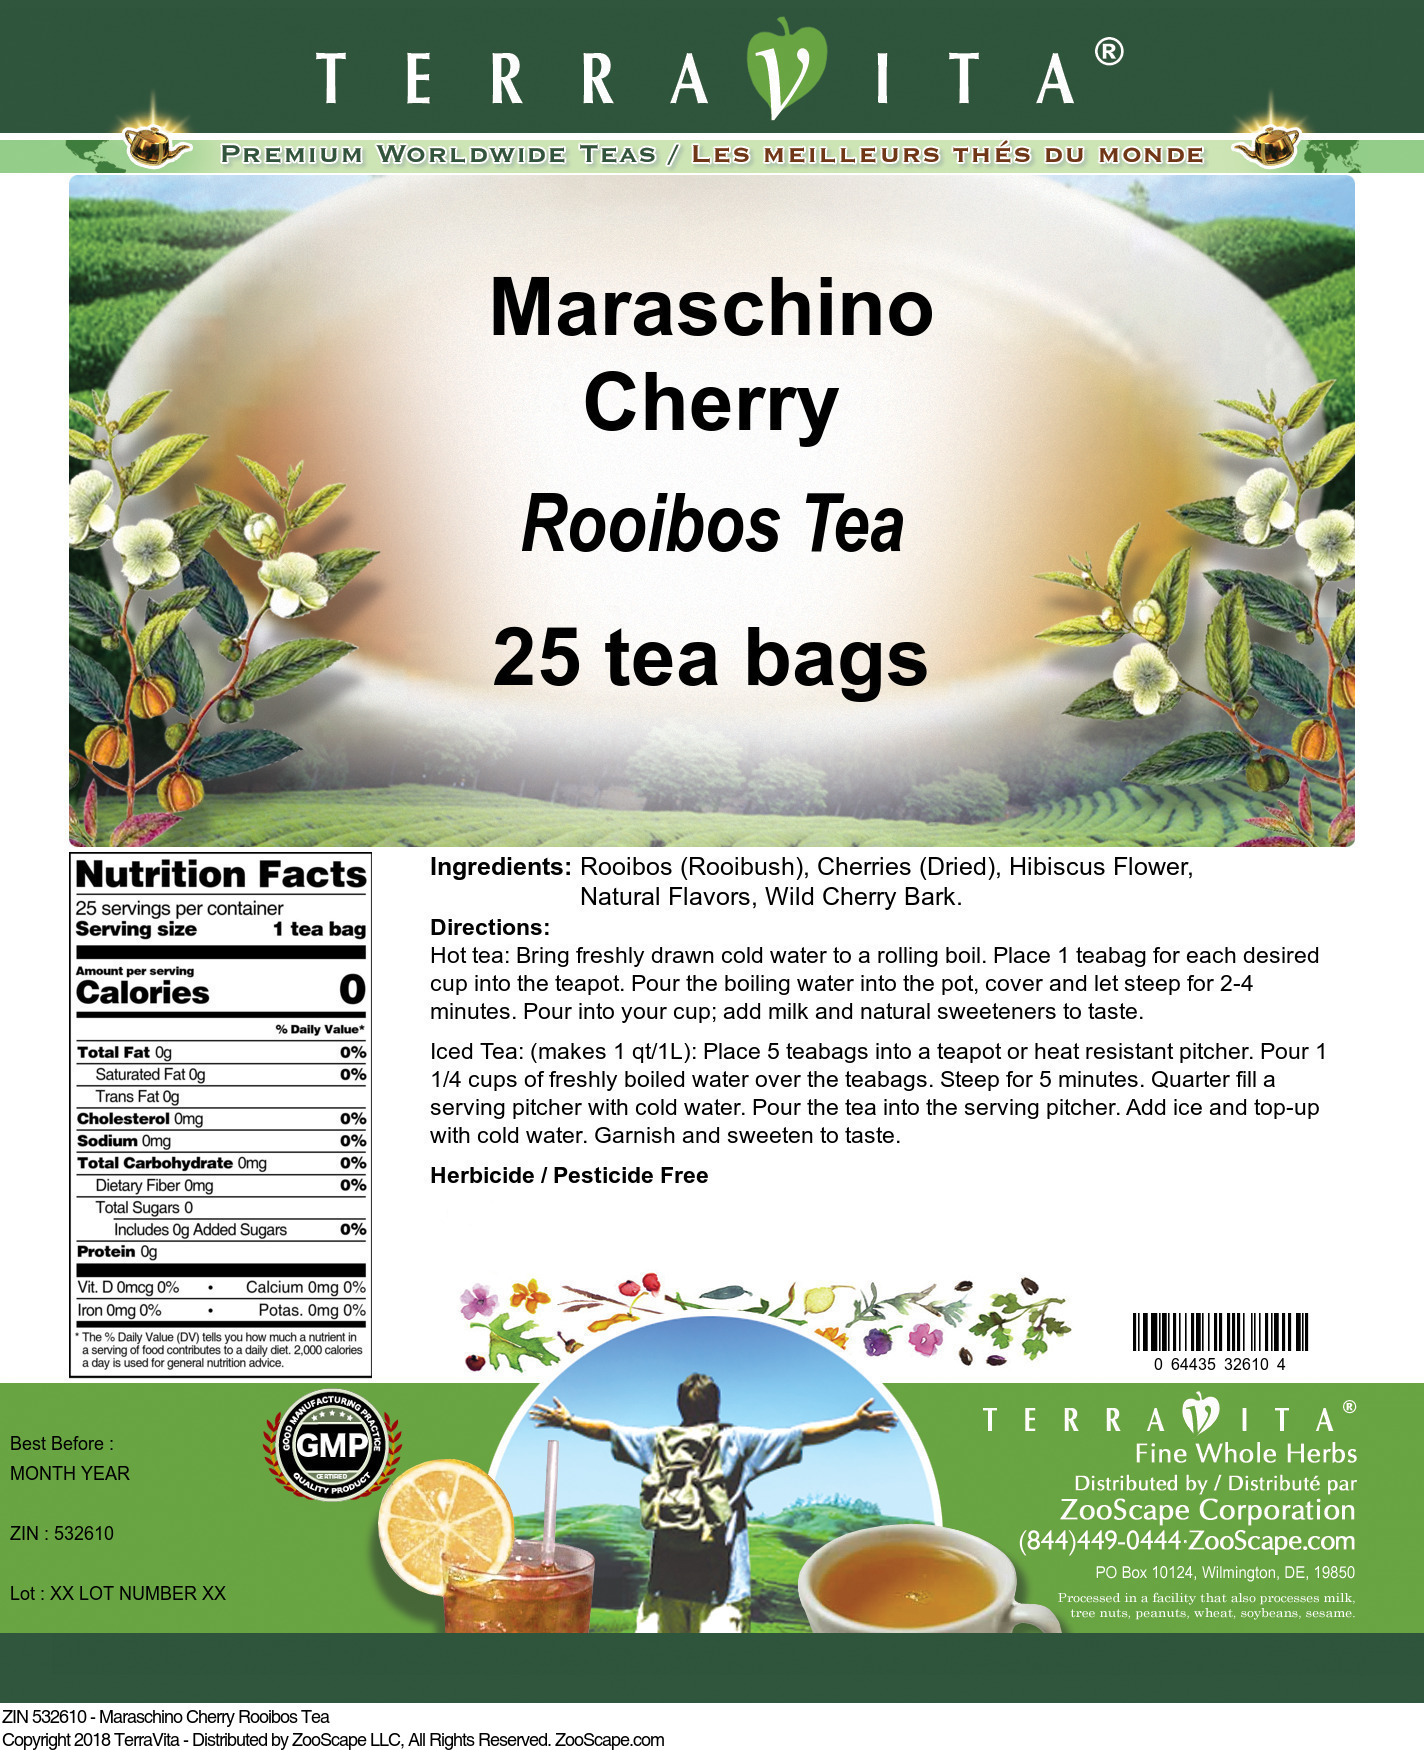 Maraschino Cherry Rooibos Tea